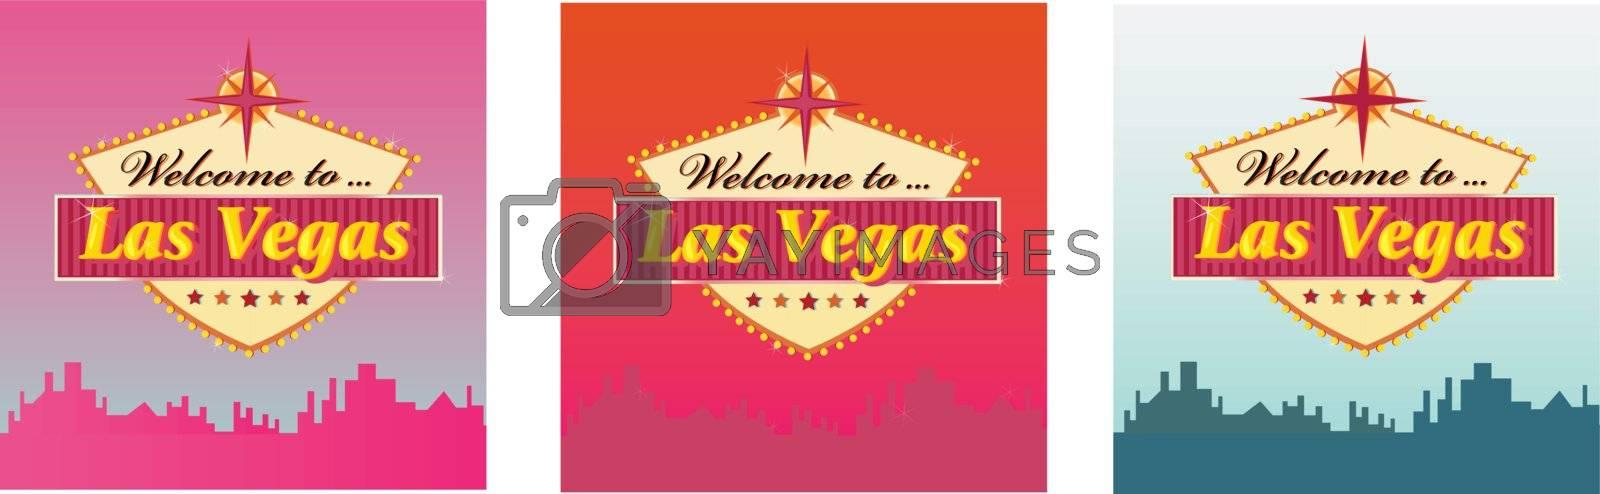 Las Vegas Welcome Sign in 3 color variants. Vector Illustration.